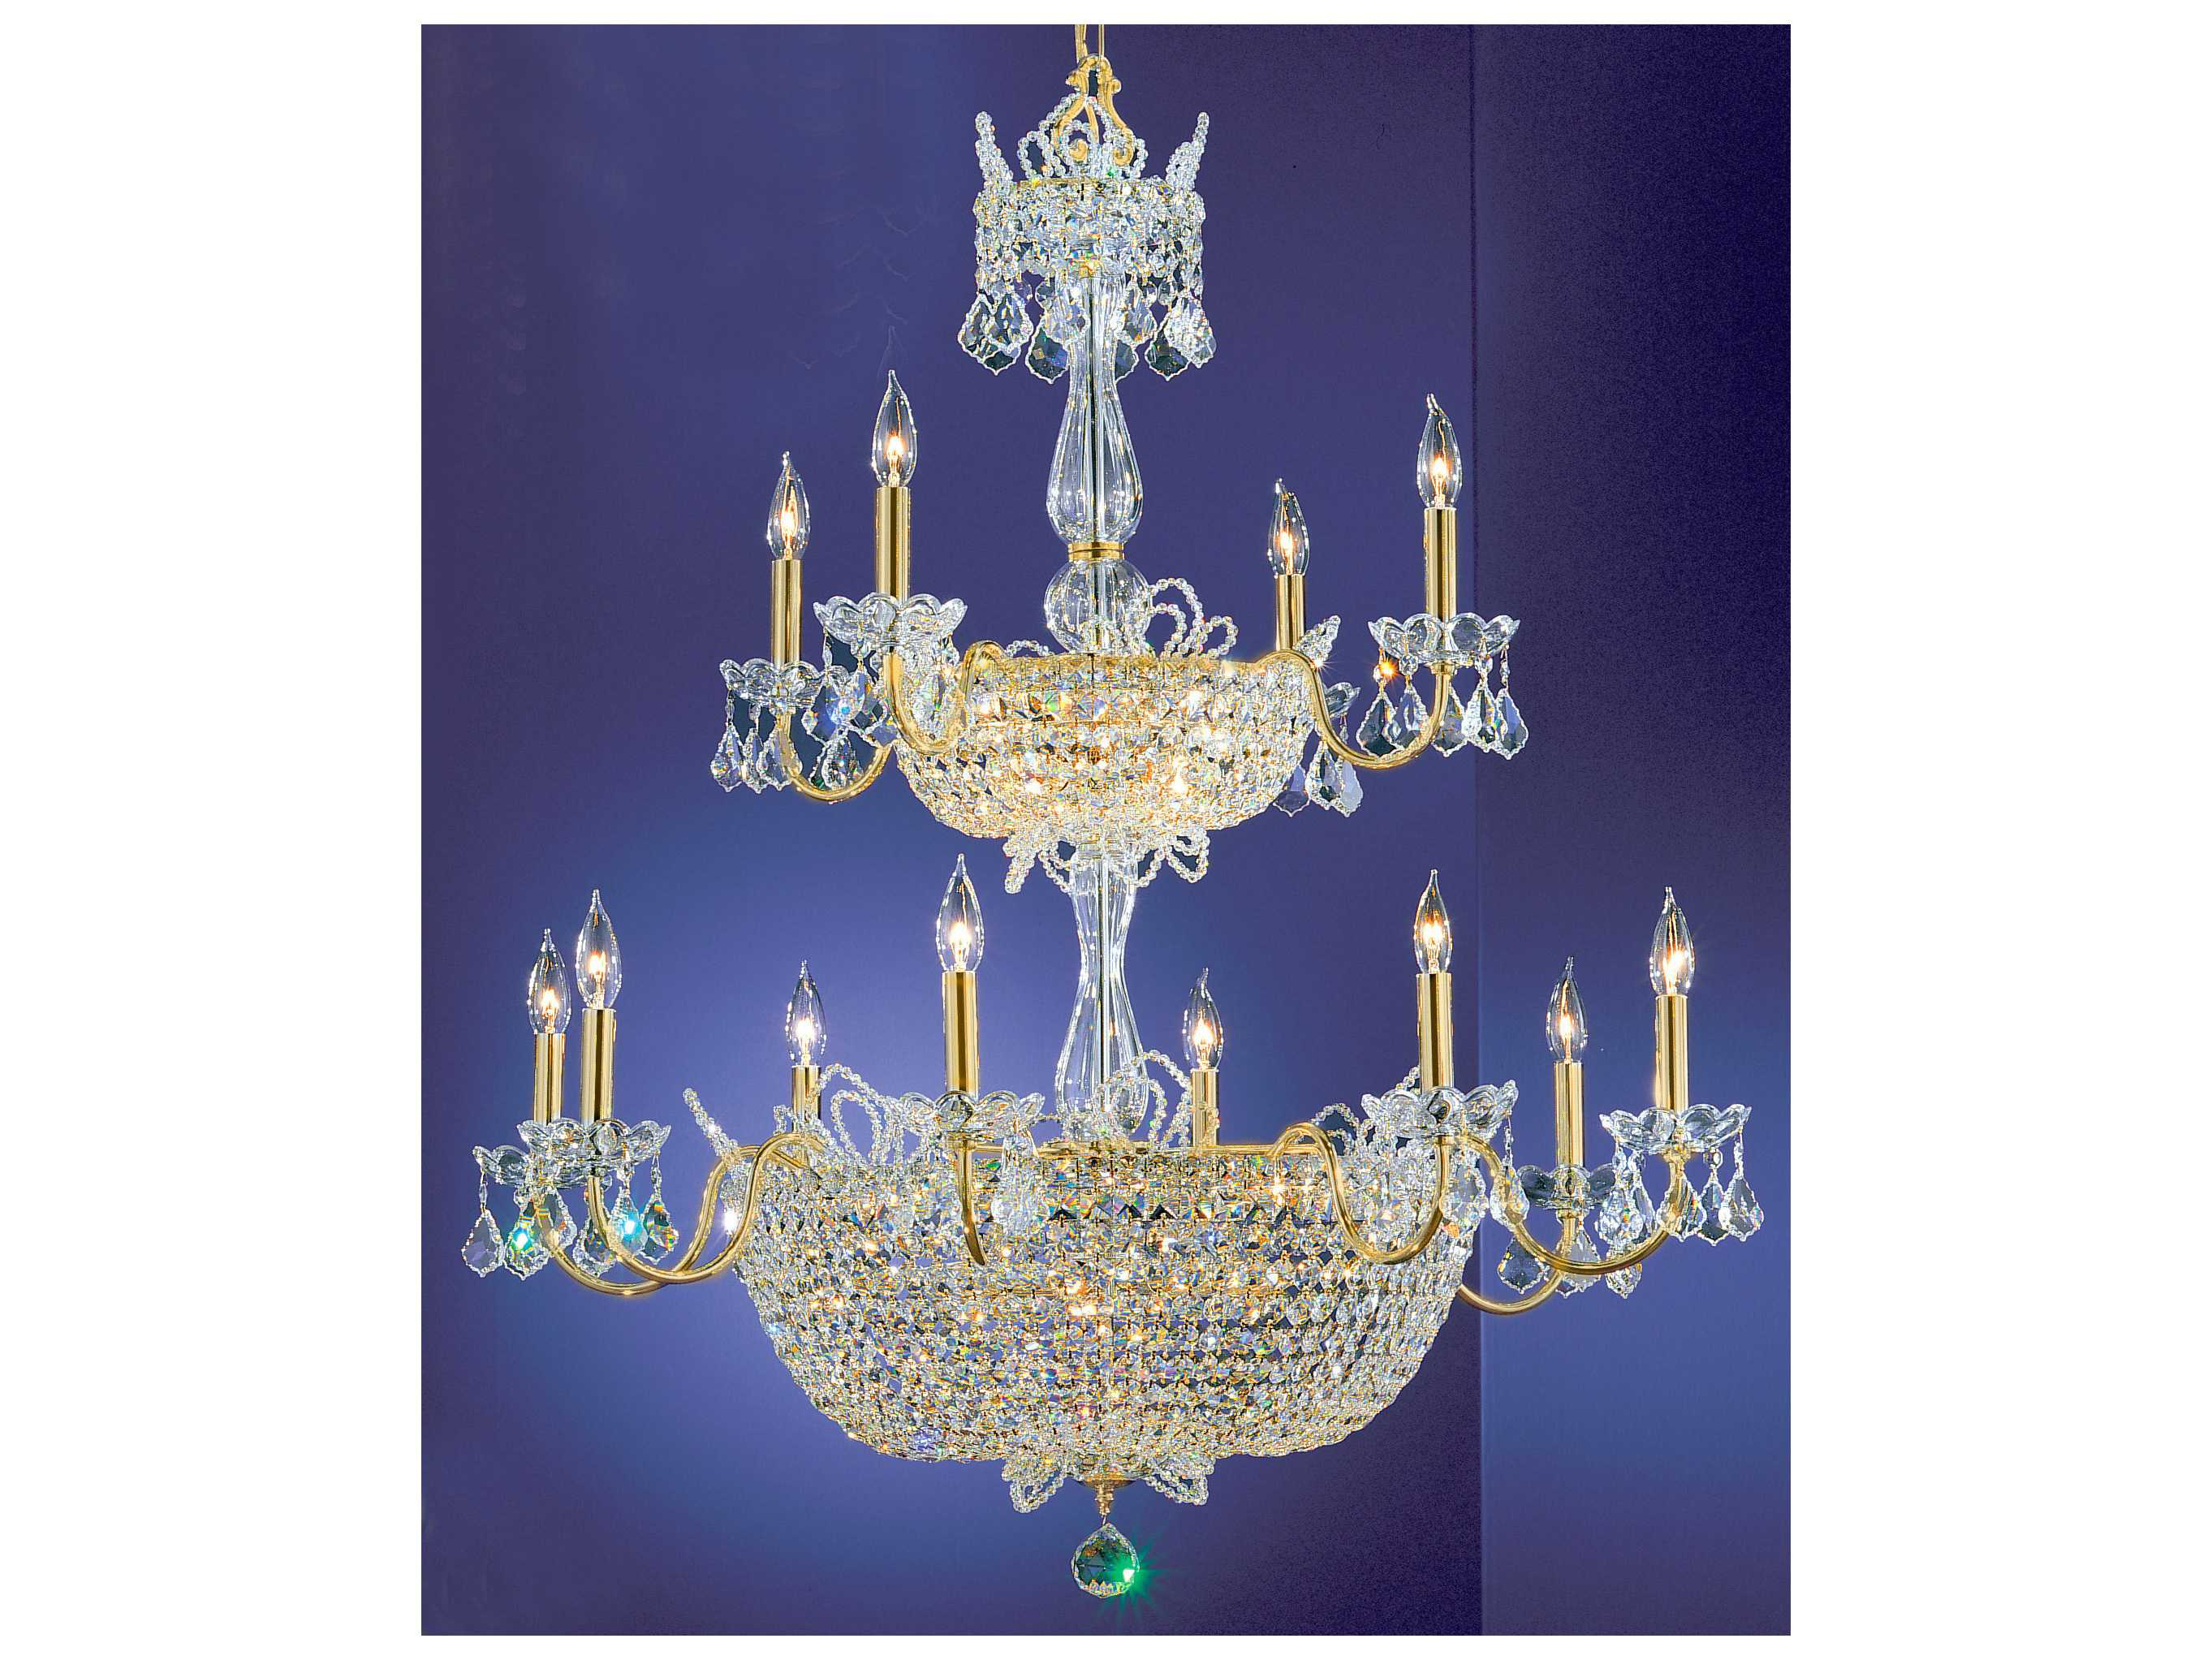 classic lighting corporation crown jewels 32 light 36 wide grand